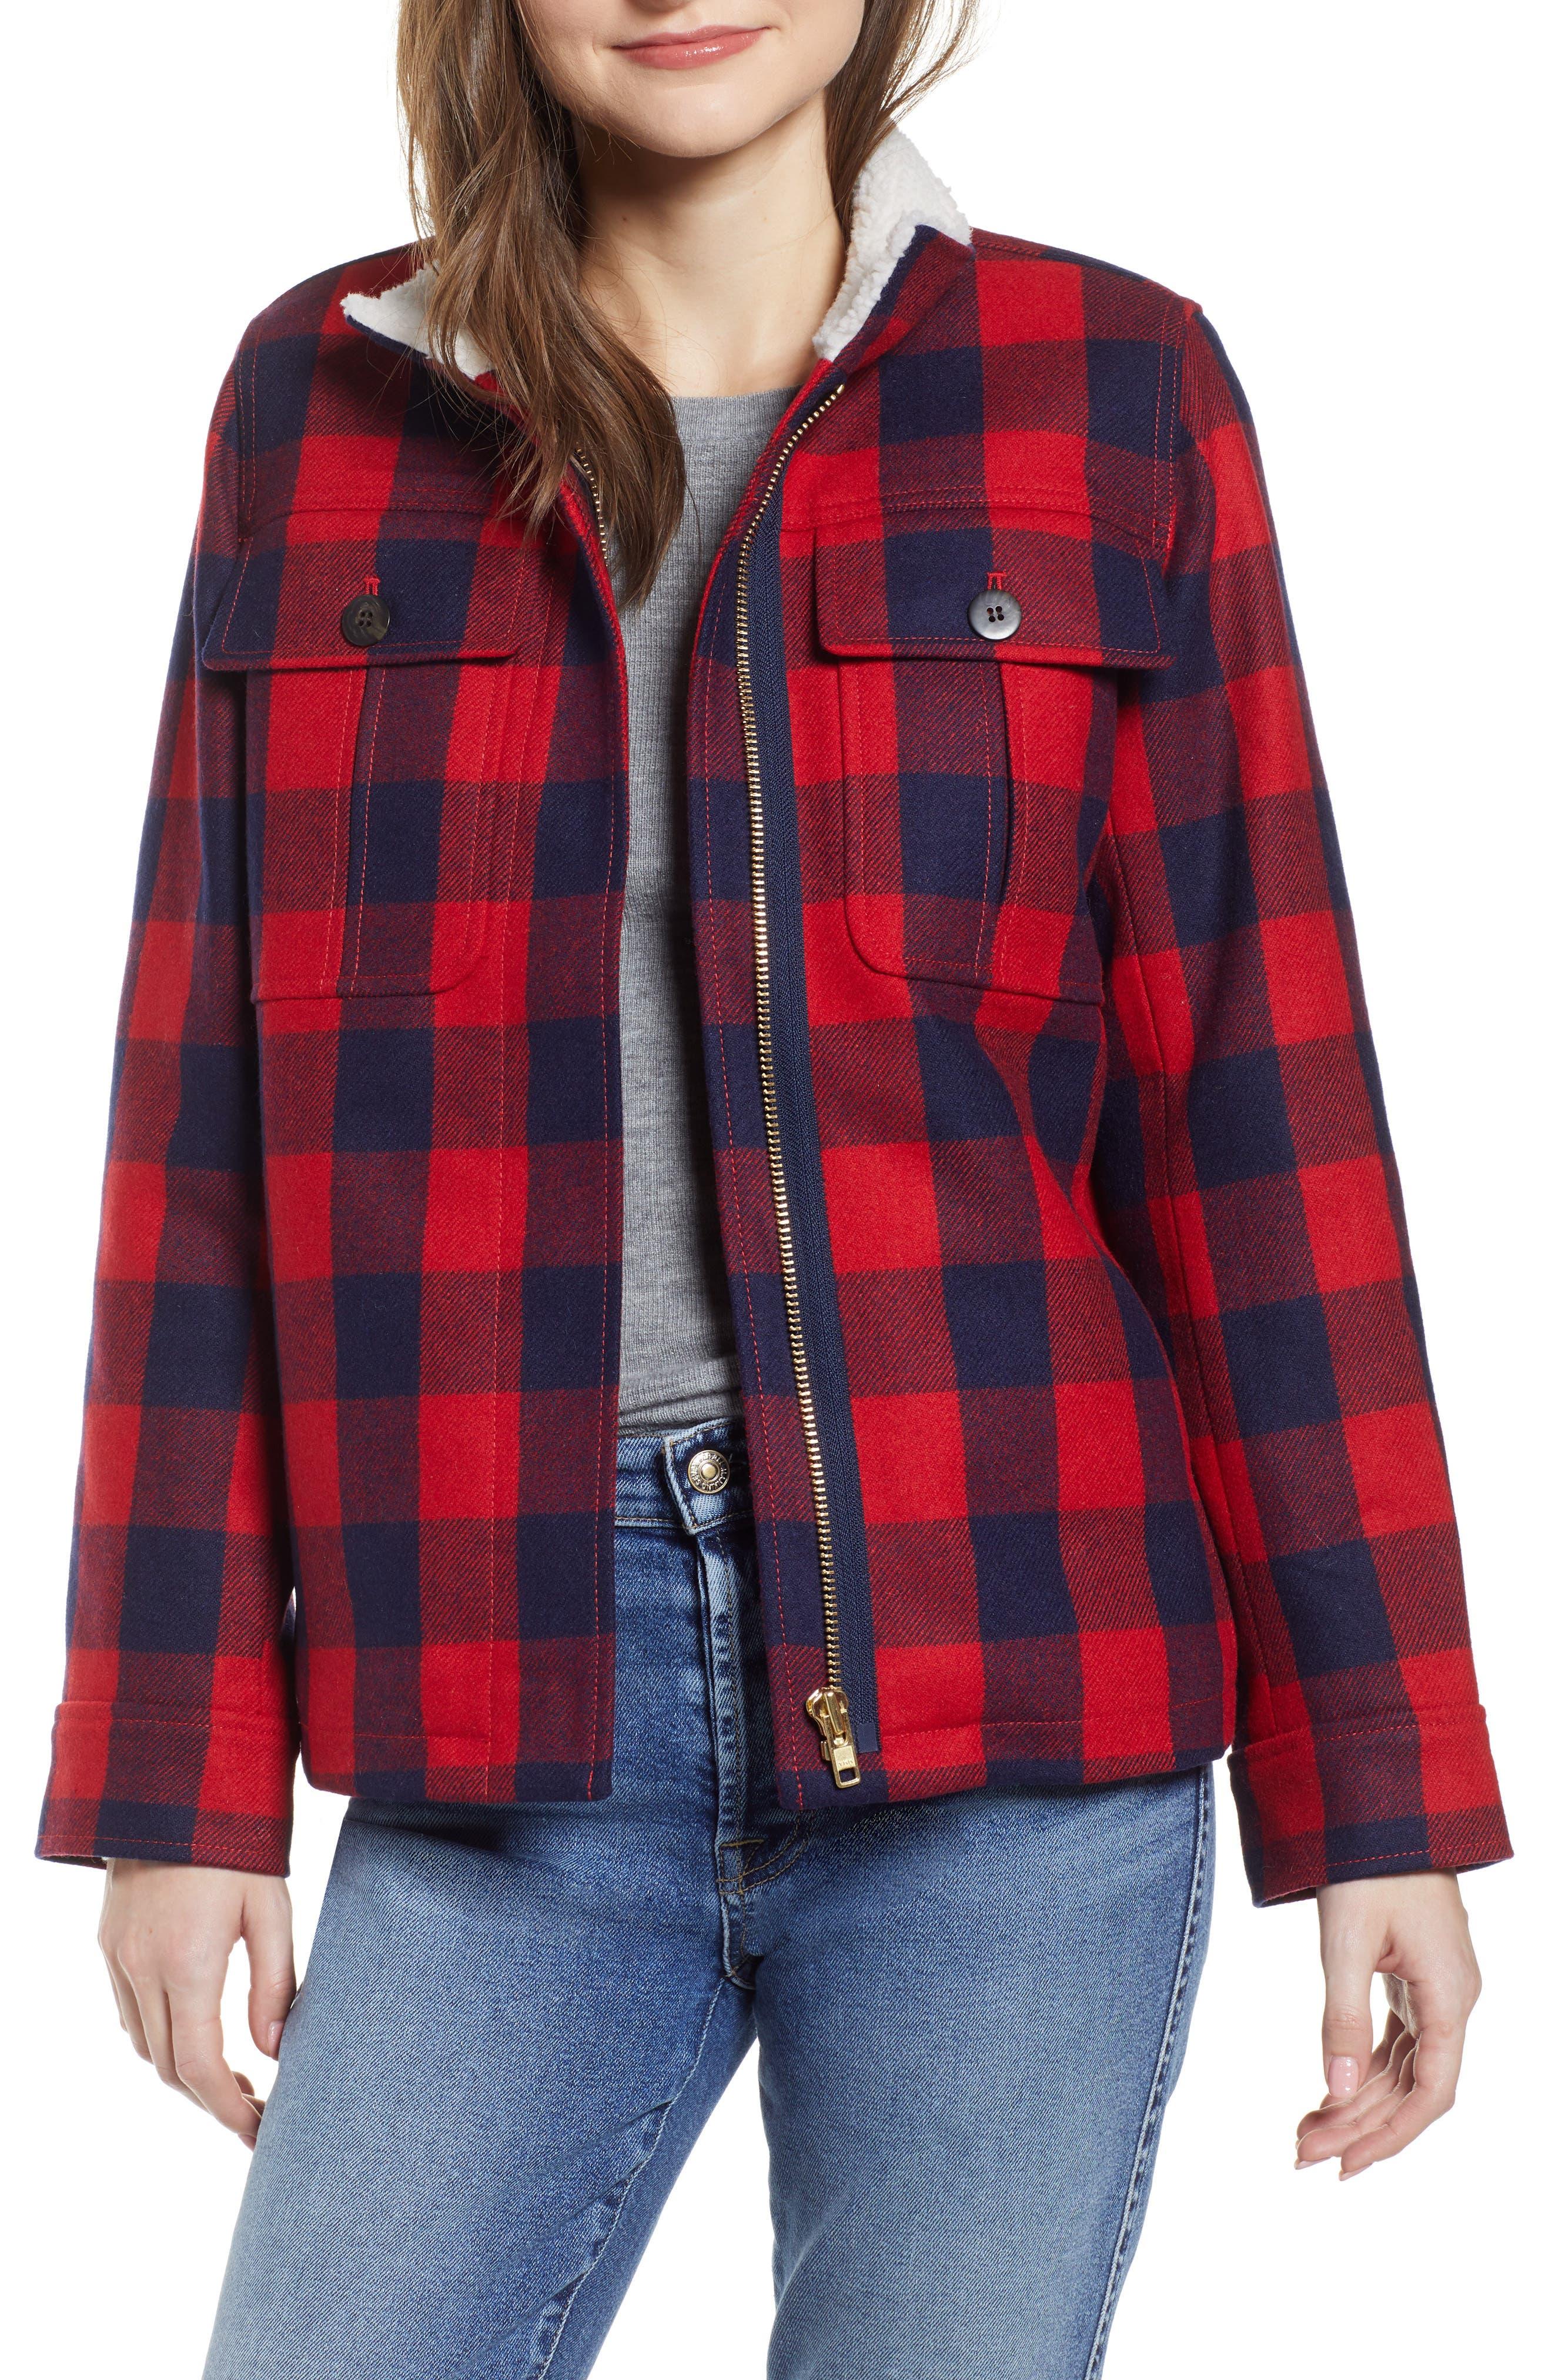 Buffalo Check Workwear Jacket with Faux Shearling Lining,                             Main thumbnail 1, color,                             RED NAVY BUFFALO